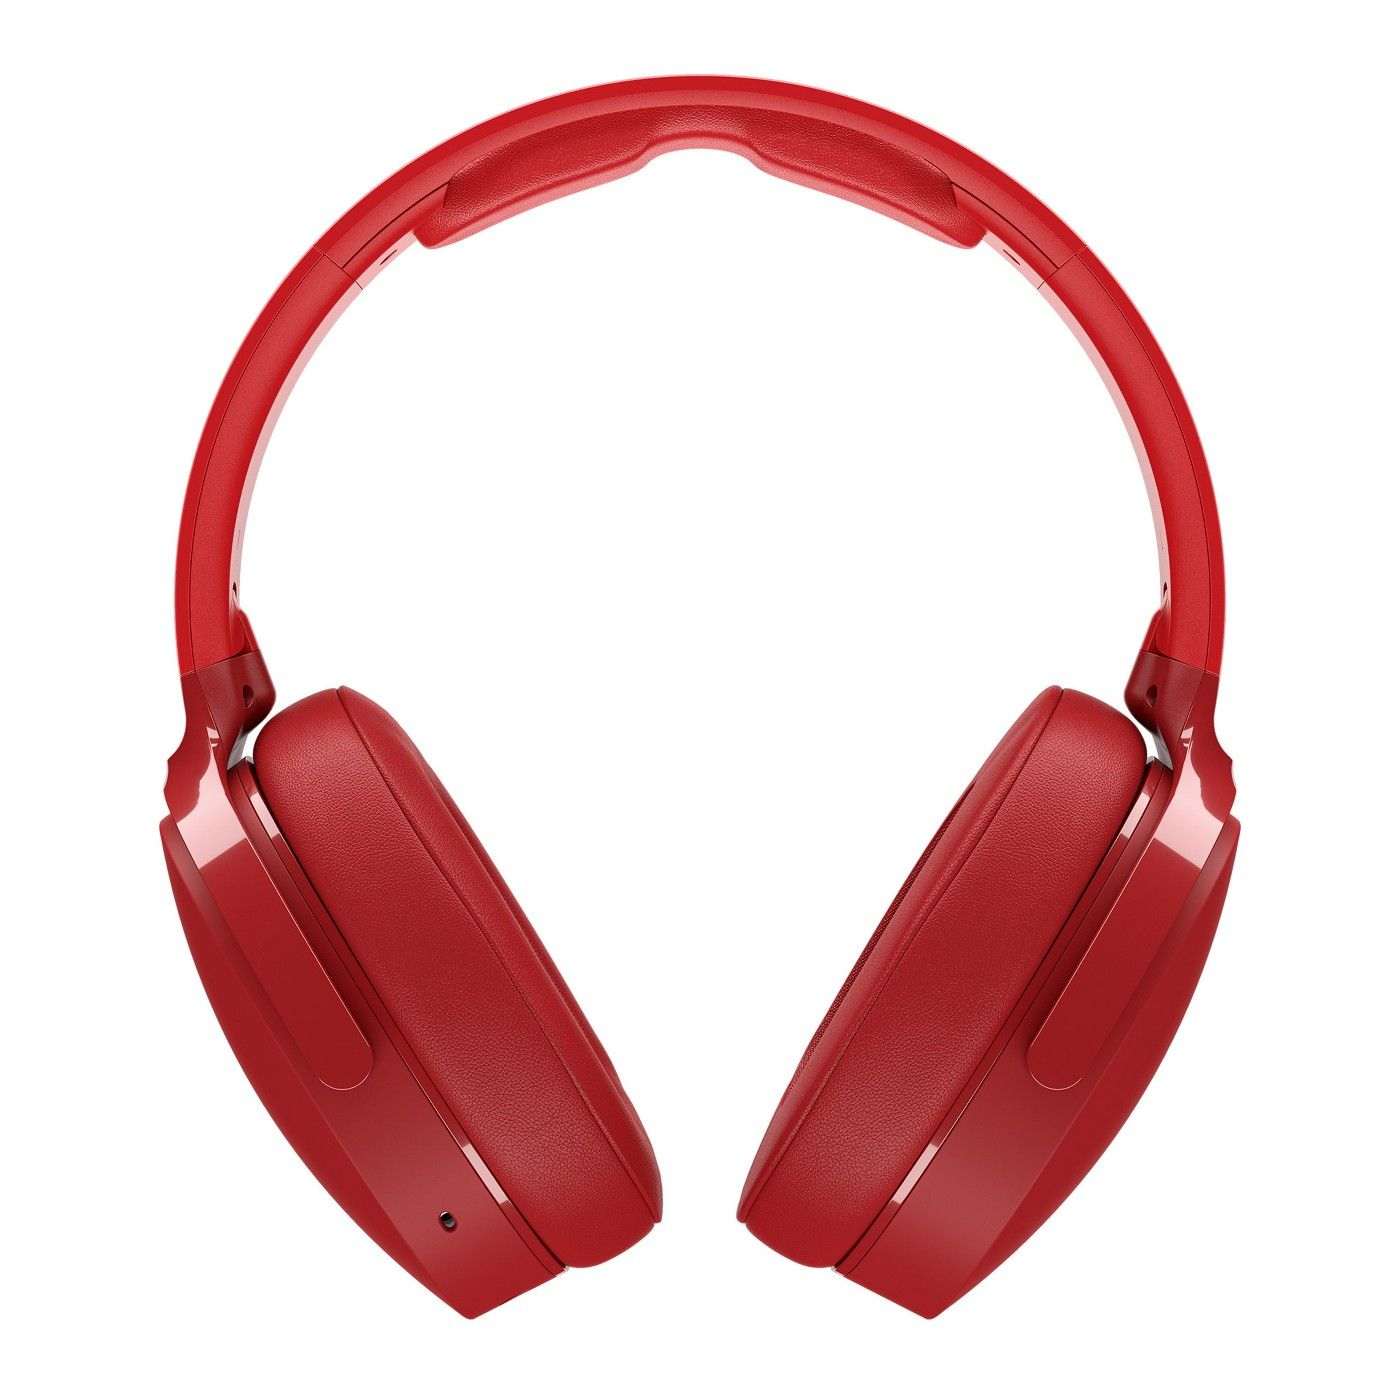 Skullcandy Hesh 3 Wireless Bluetooth OverEar Headphone